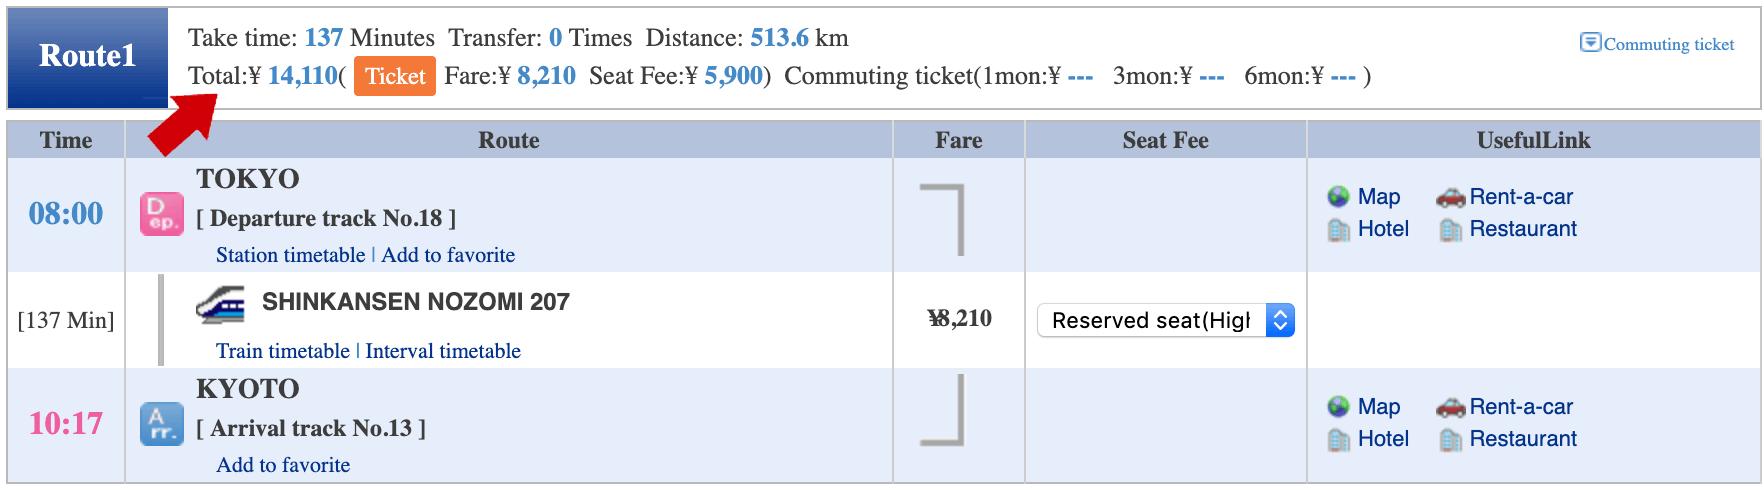 Hyperdia search for shinkansen tickets from Tokyo to Kyoto